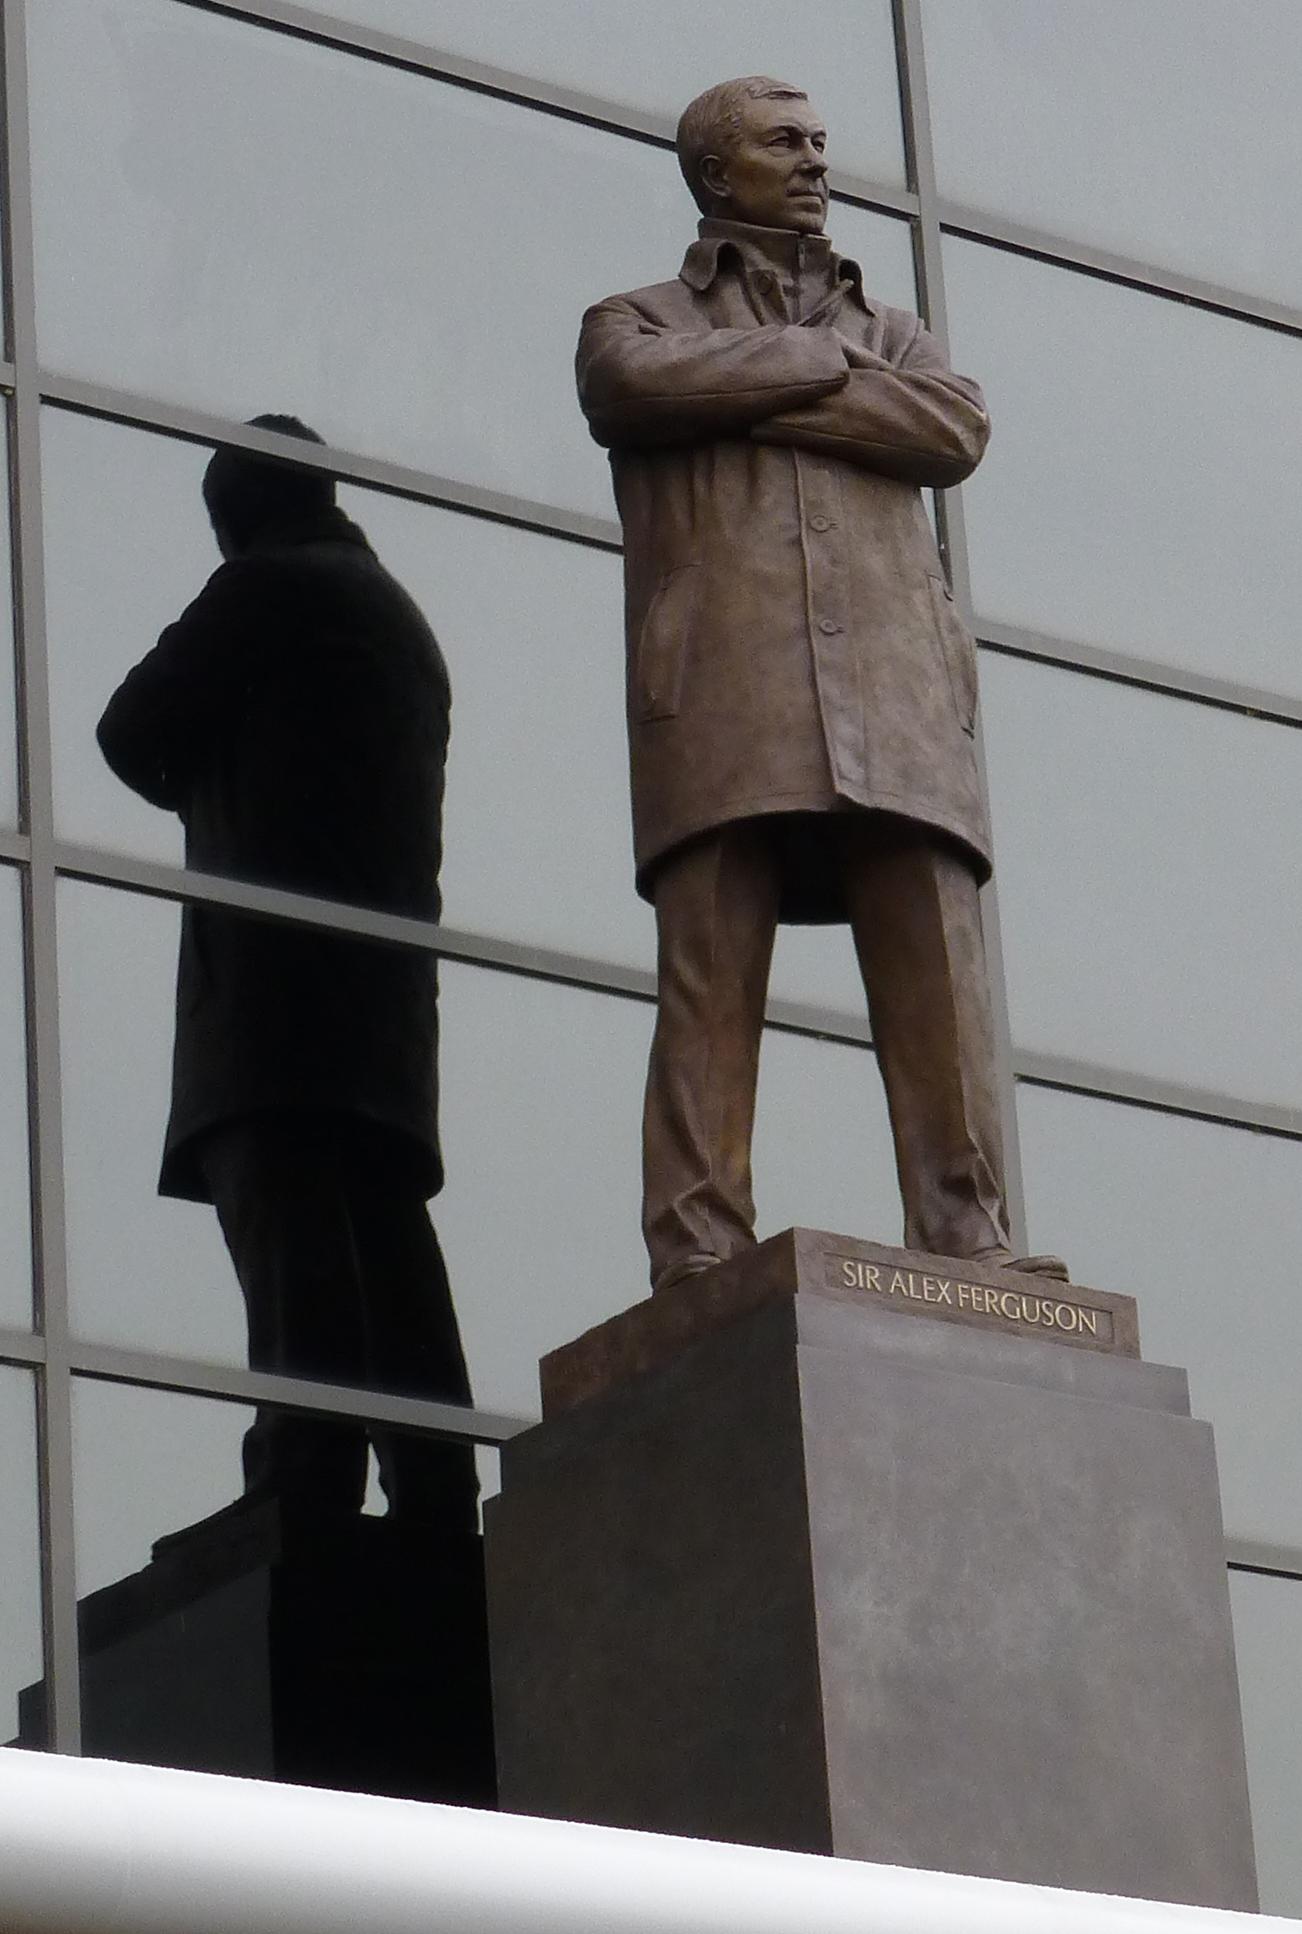 2a857eeb6426b File:Sir Alex Ferguson statue at Old Trafford.jpg - Wikimedia Commons